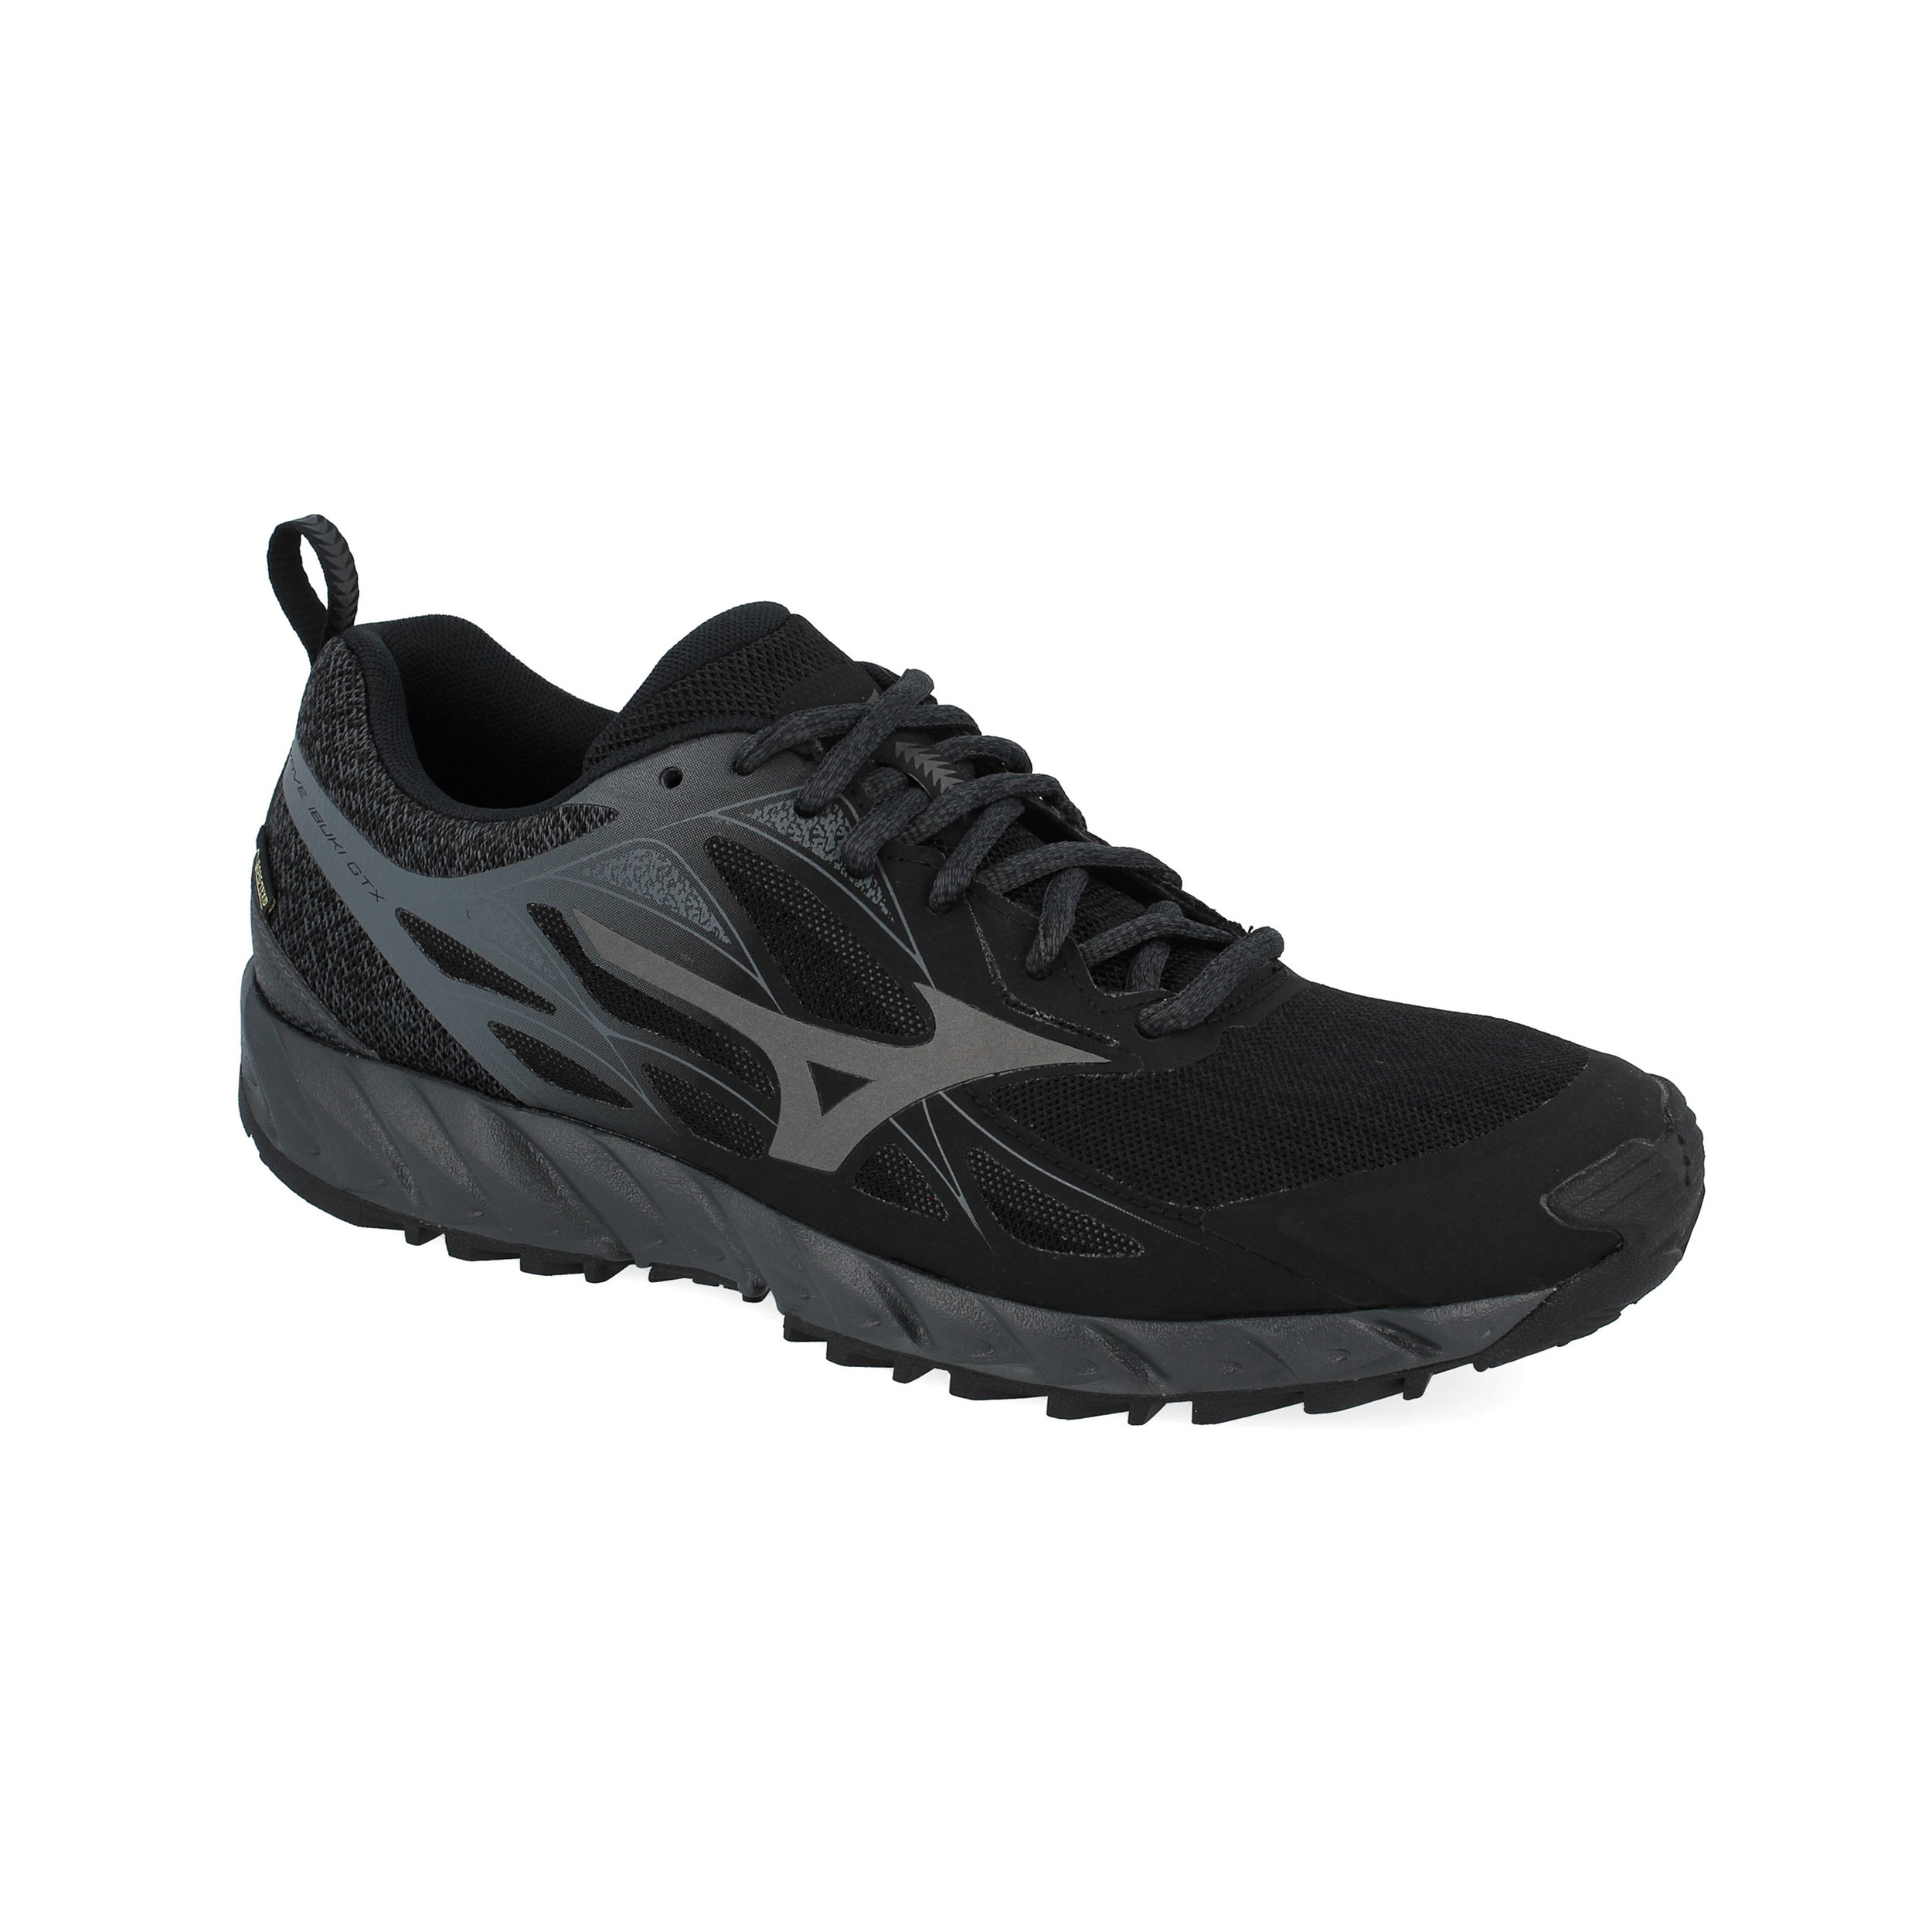 Mizuno-da-uomo-Wave-Ibuki-GORE-TEX-TRAIL-RUNNING-scarpe-da-ginnastica-Black miniatura 9